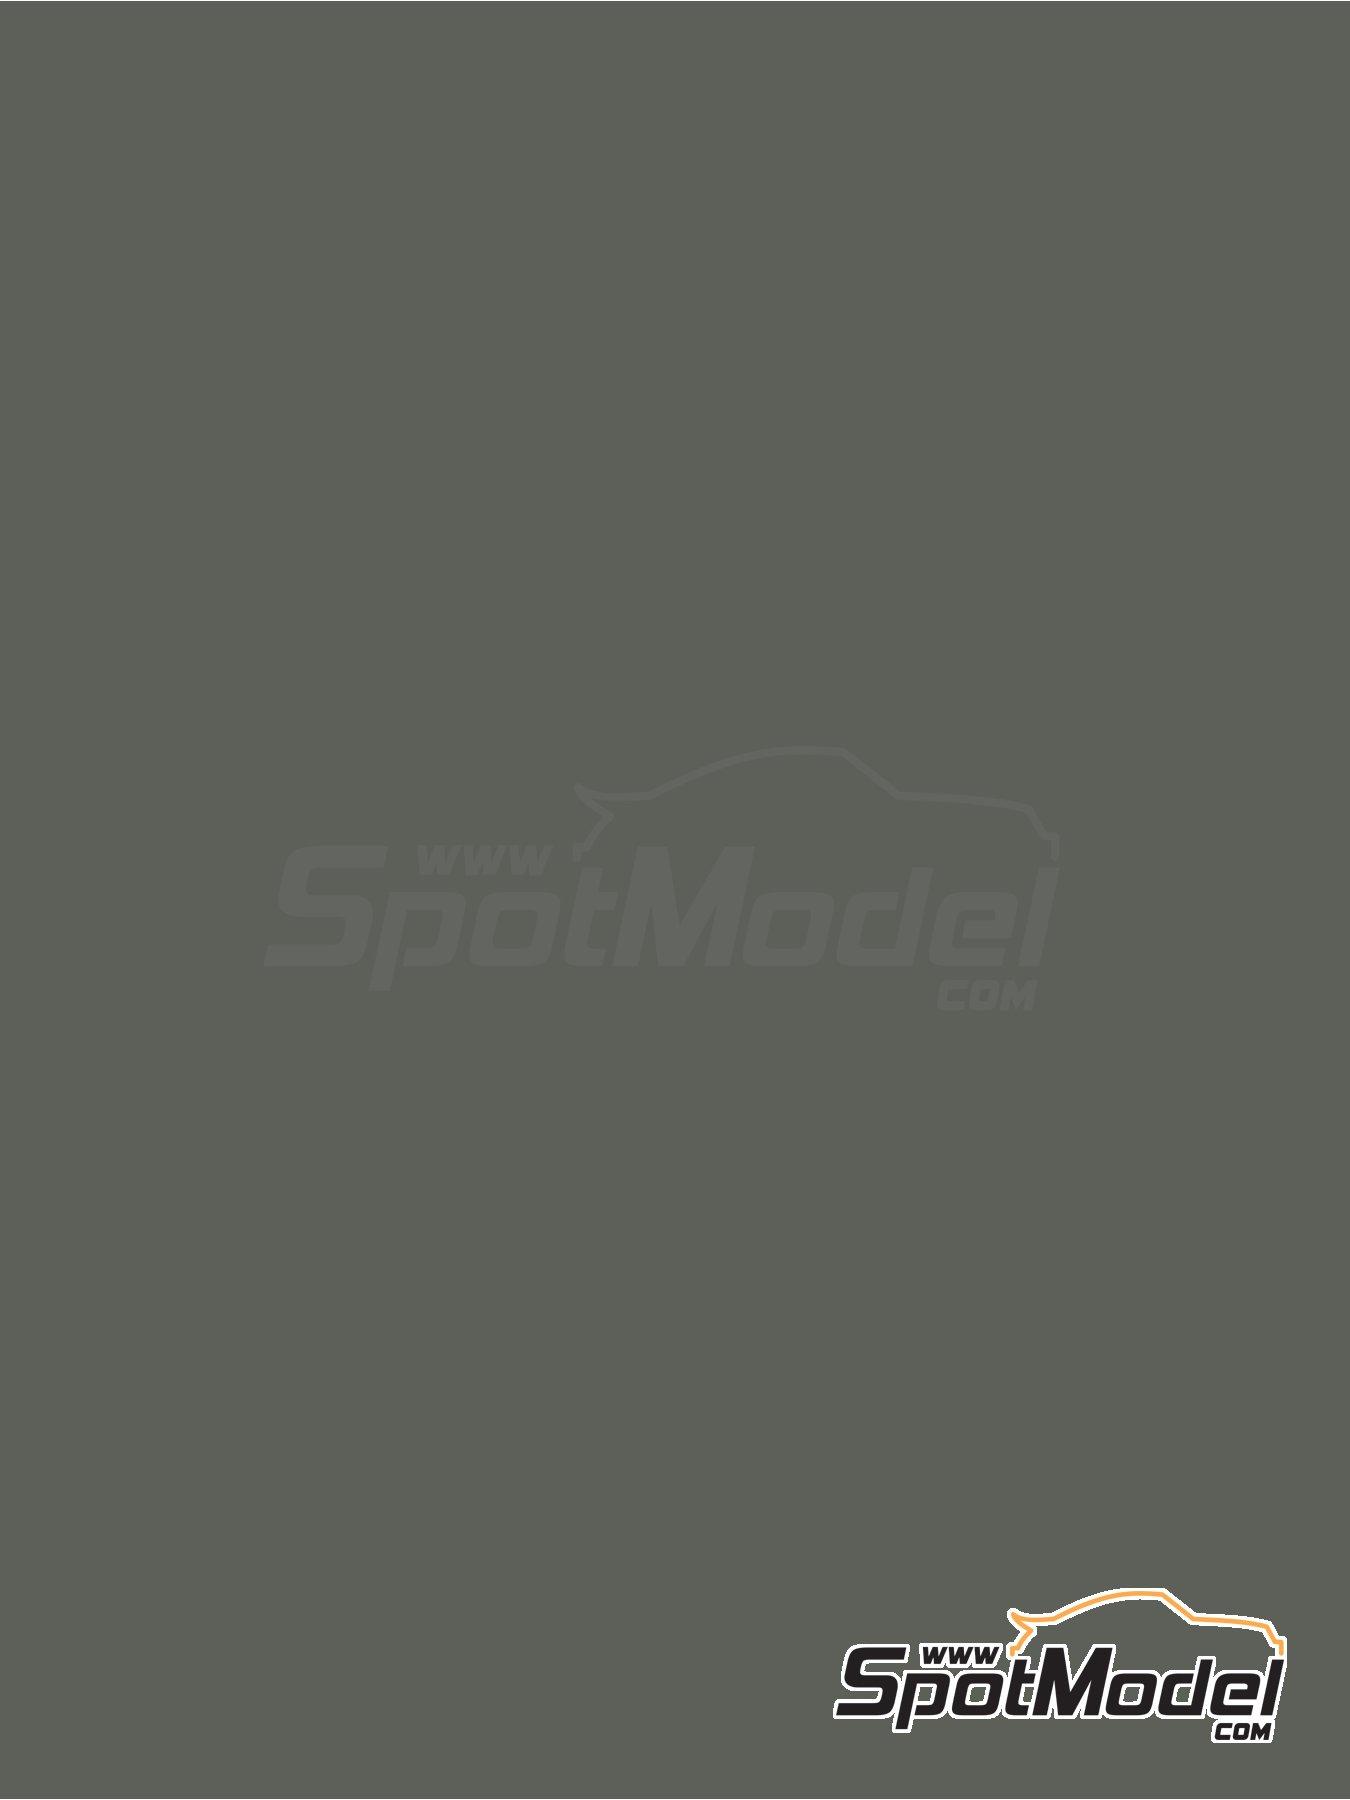 Gris verdoso - RAL7009 - Green grey - 1 x 60ml   Pintura fabricado por Zero Paints (ref.ZP-1033-RAL7009) image